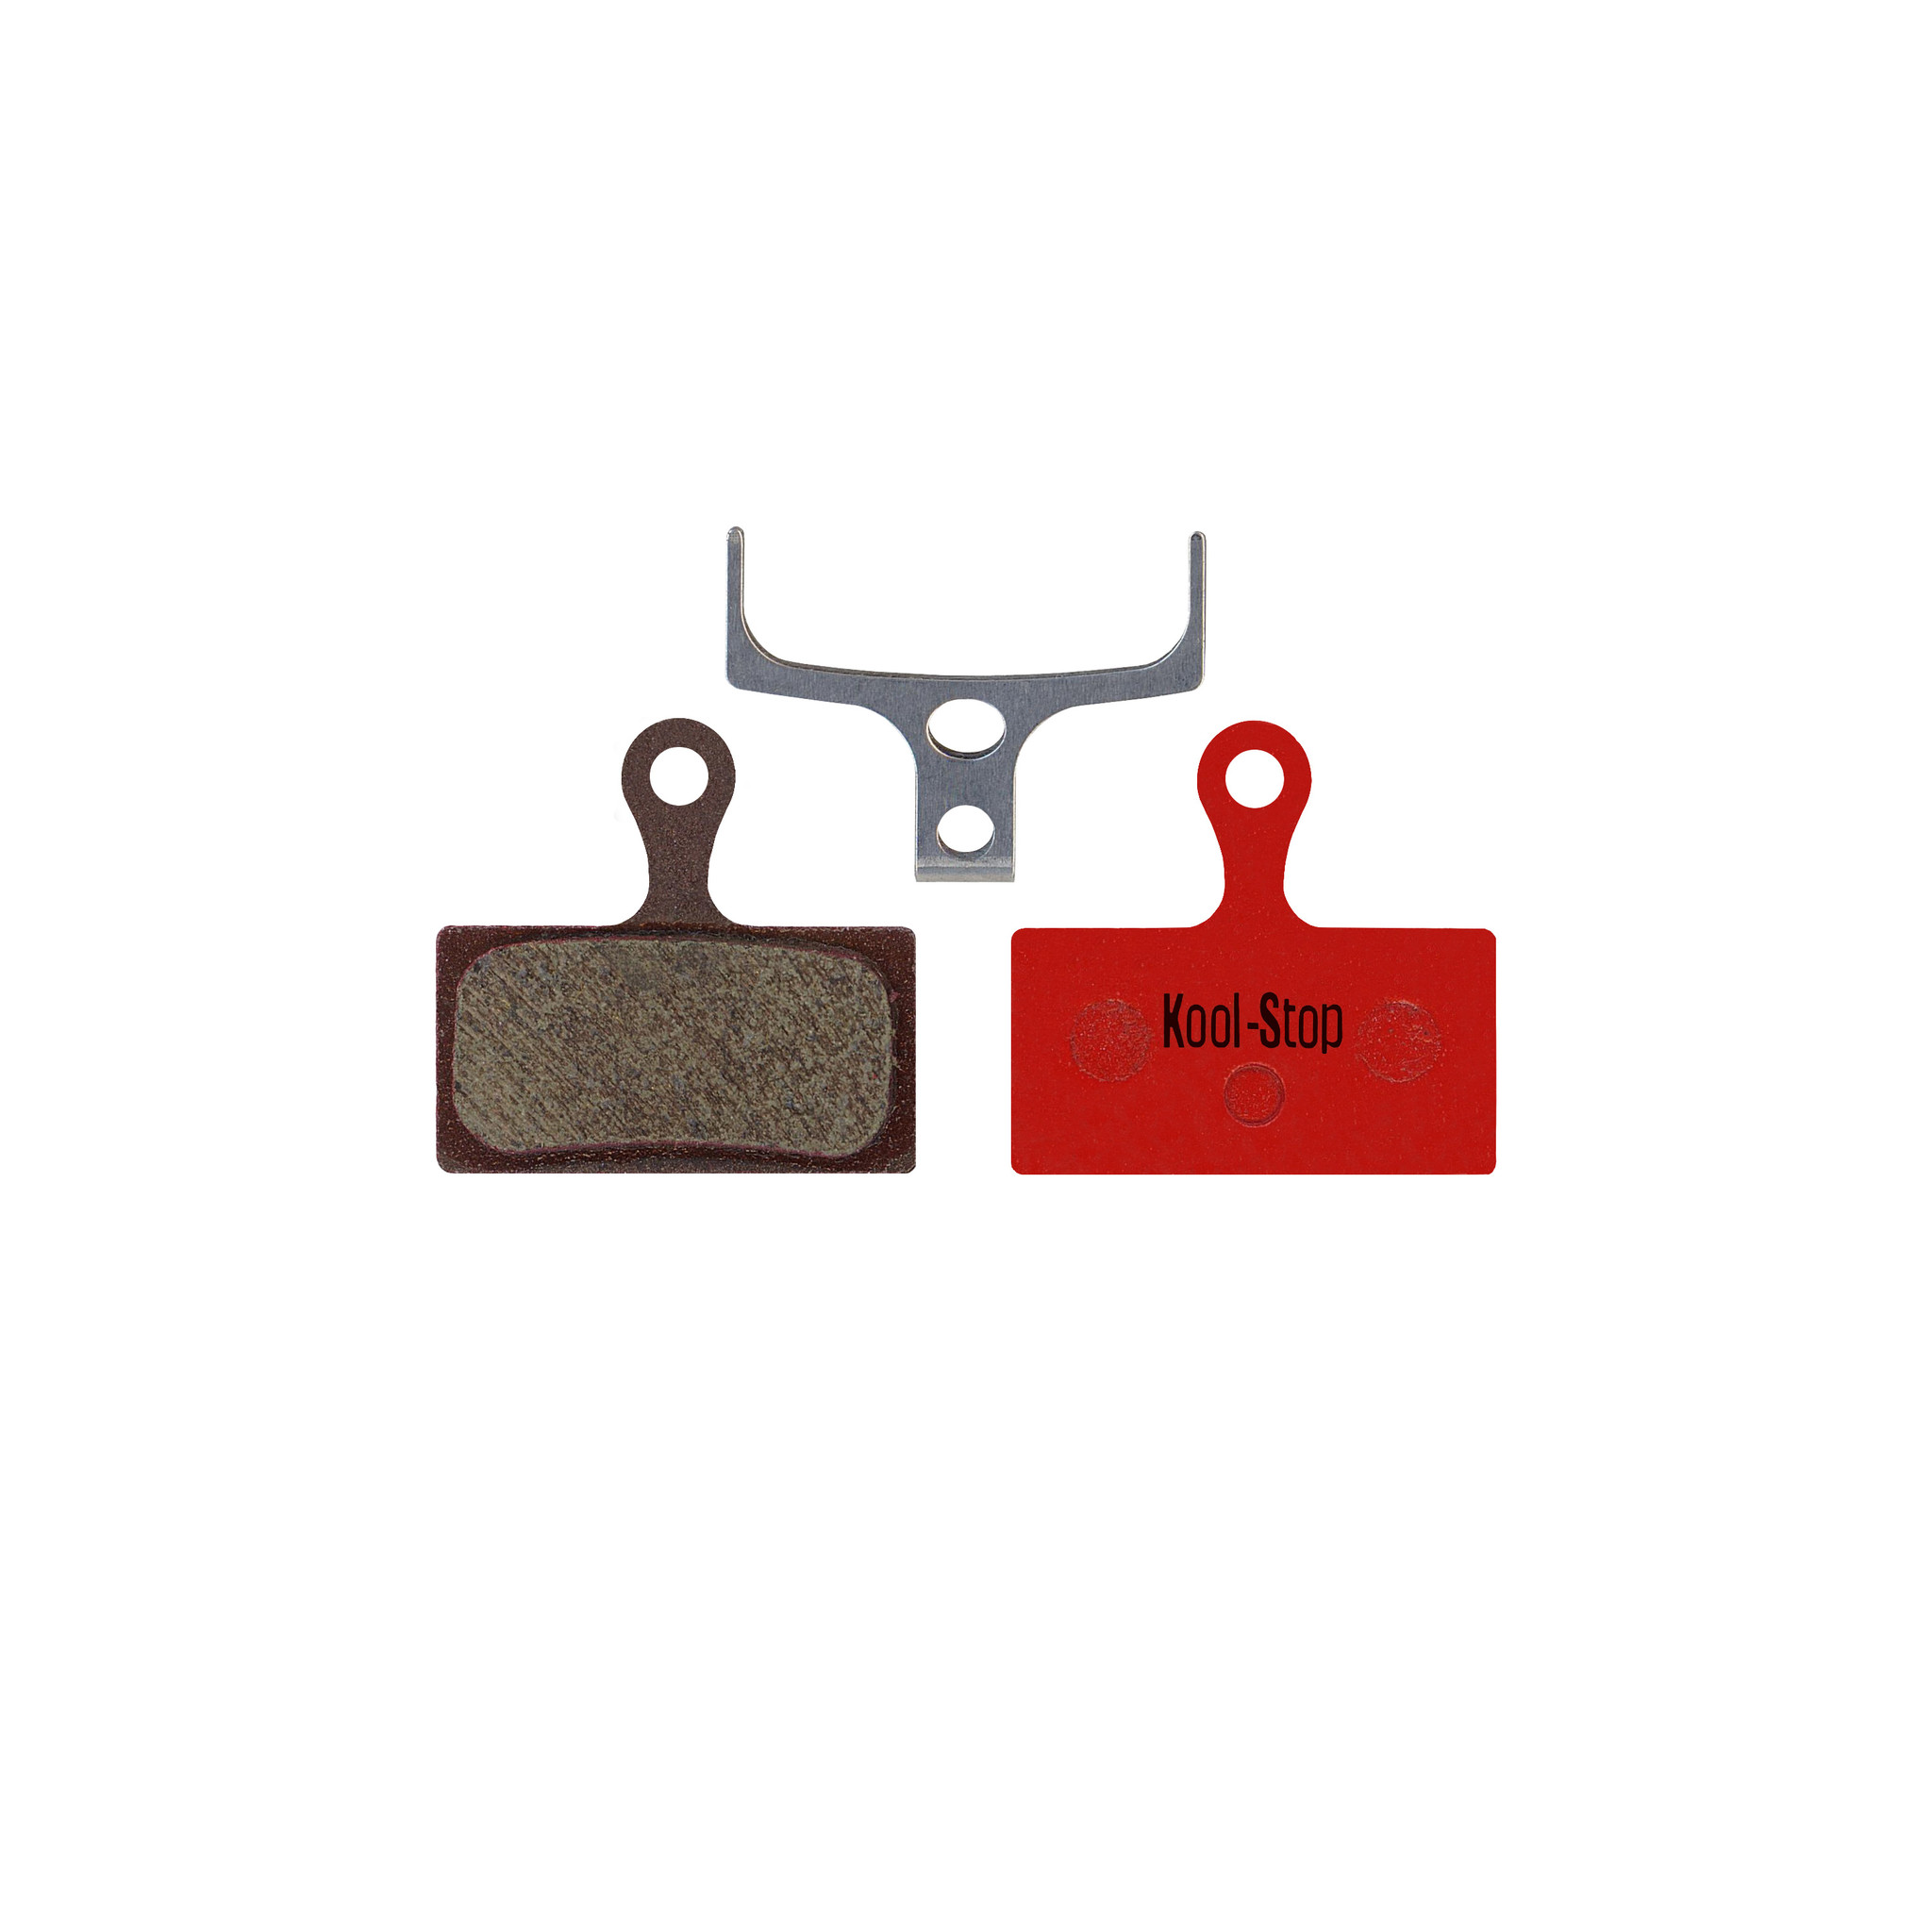 Kool-Stop Shimano Organic M9000/M8000 Disc Brake Pads Steel Plate #KS-D635-1